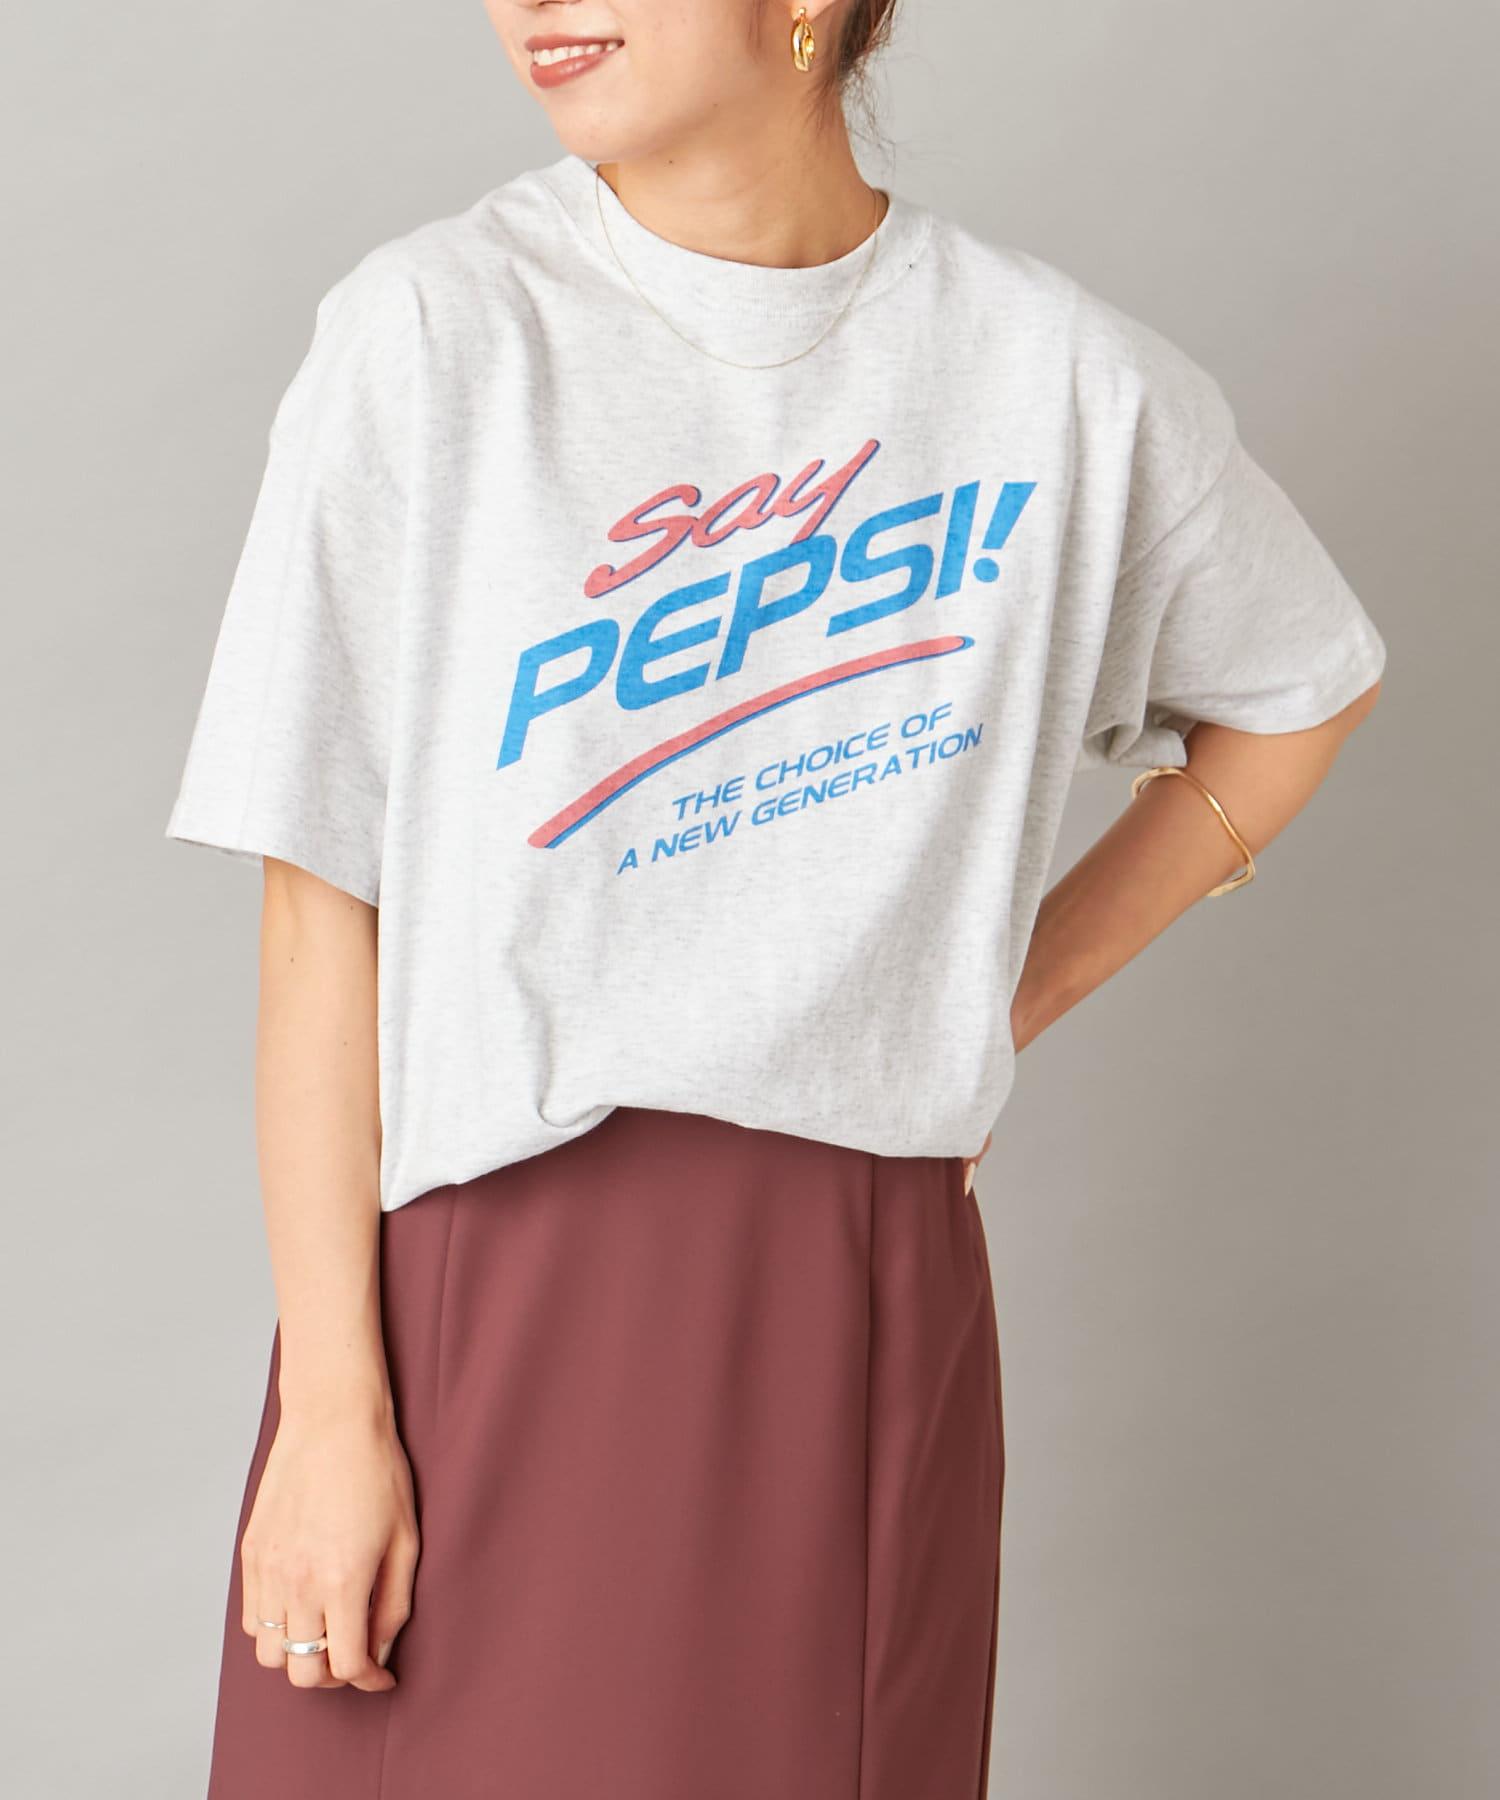 Omekashi(オメカシ) PEPSI Tシャツ